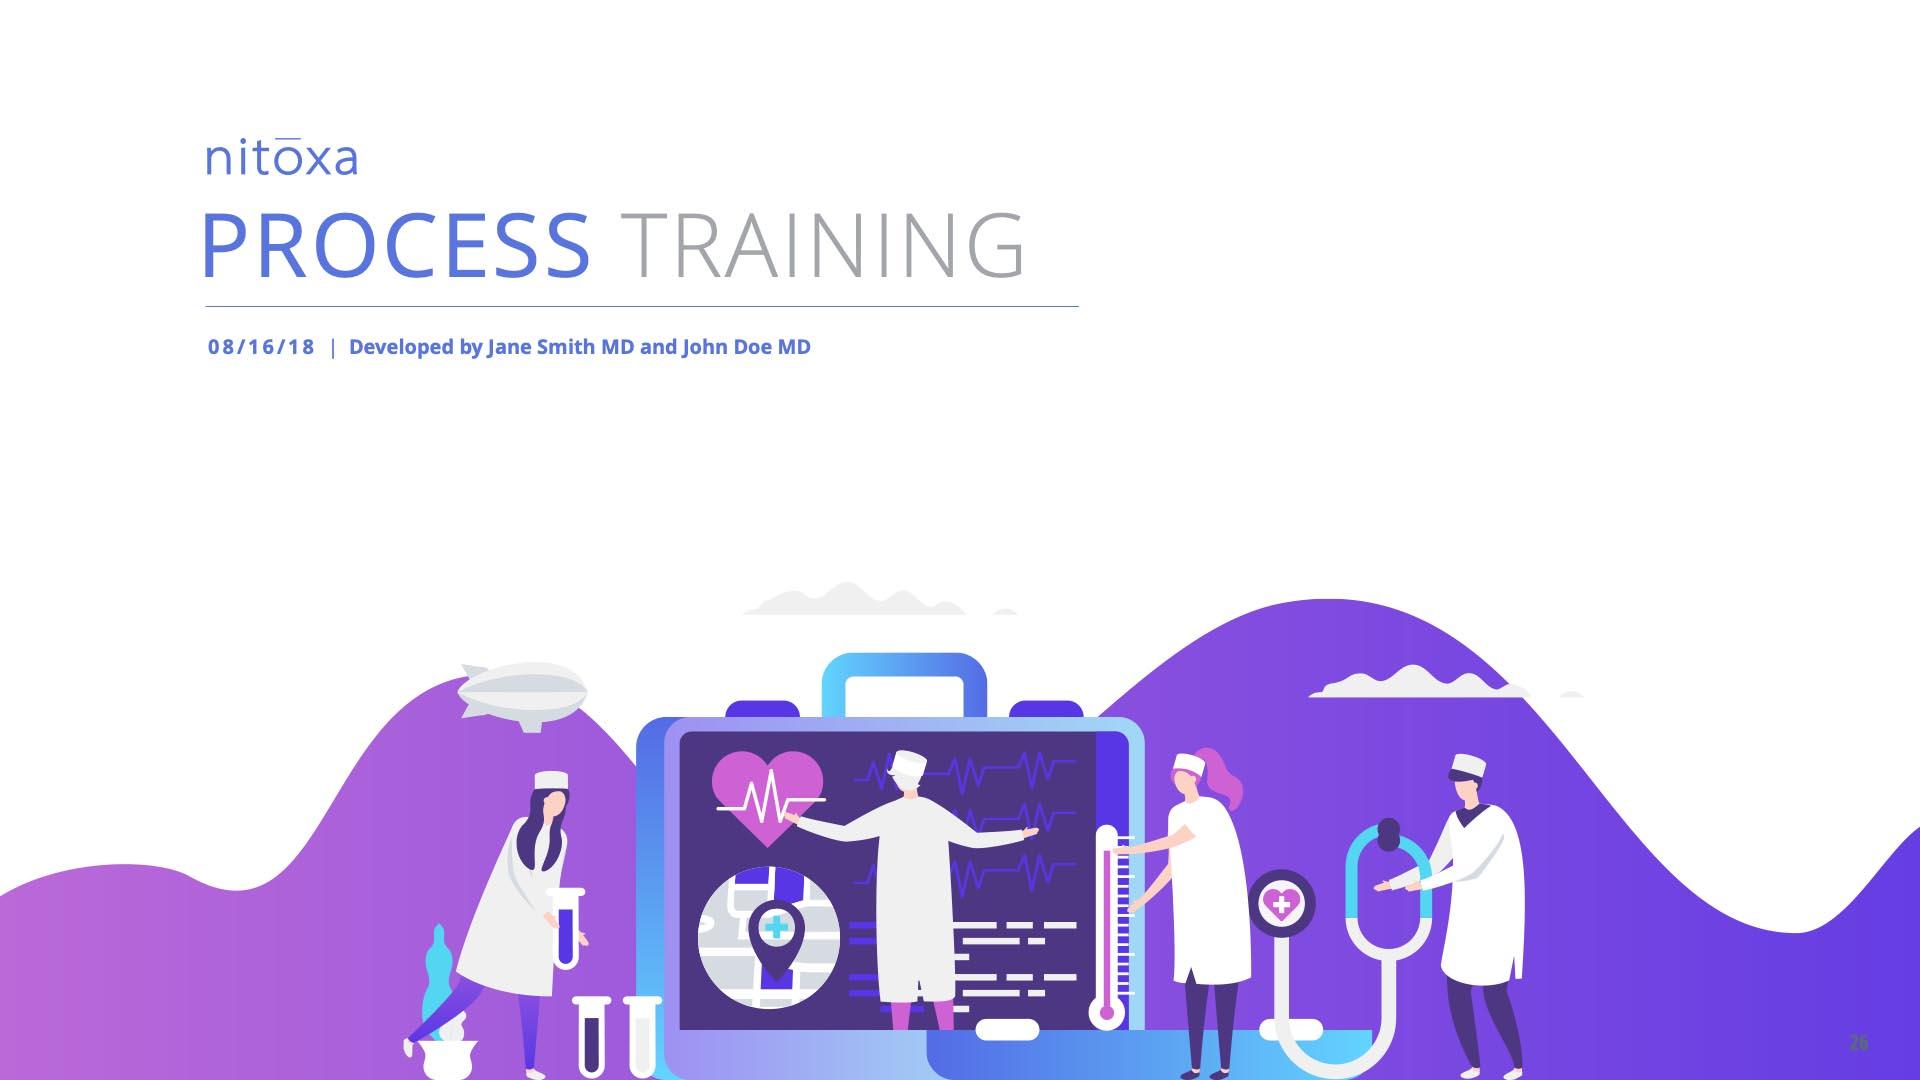 Slide Design sample: Cover illustration with doctors looking at medical imaging equipment